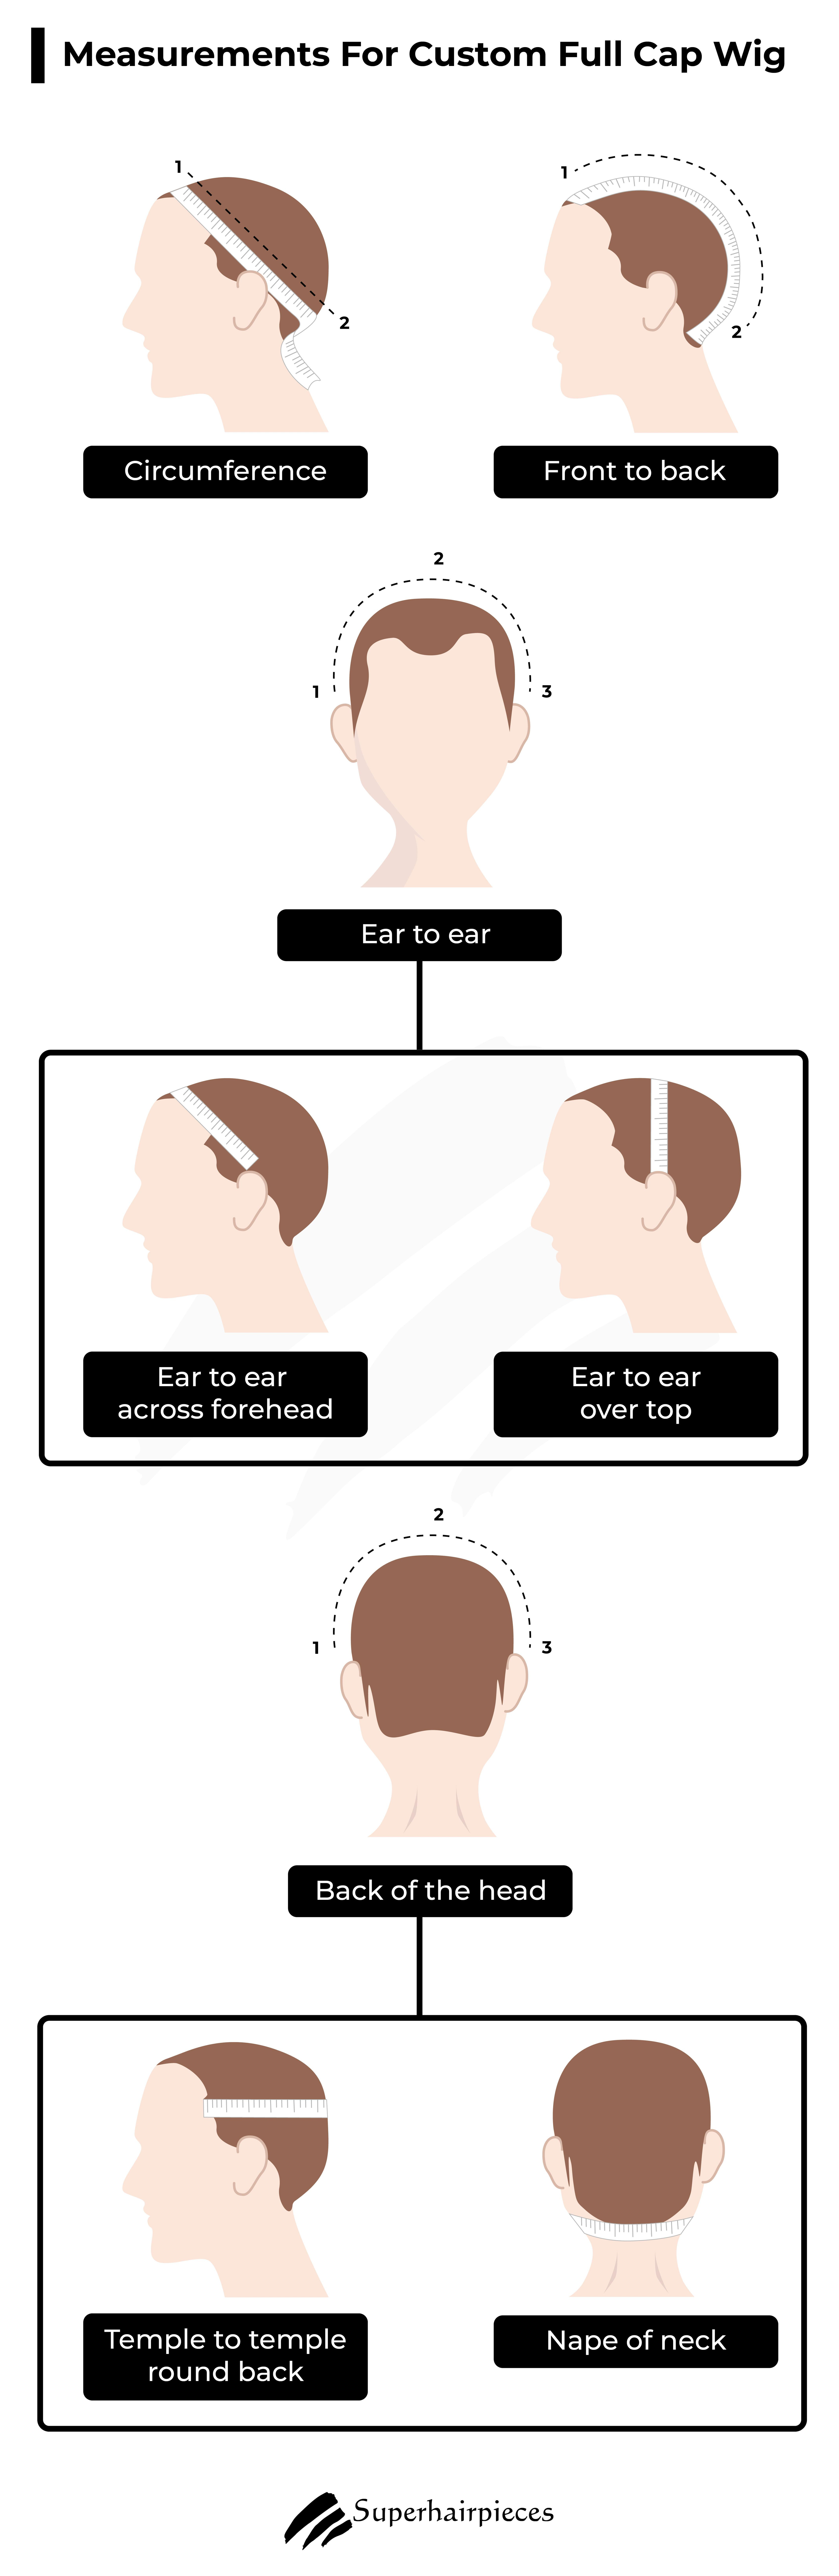 full cap wig measurement chart